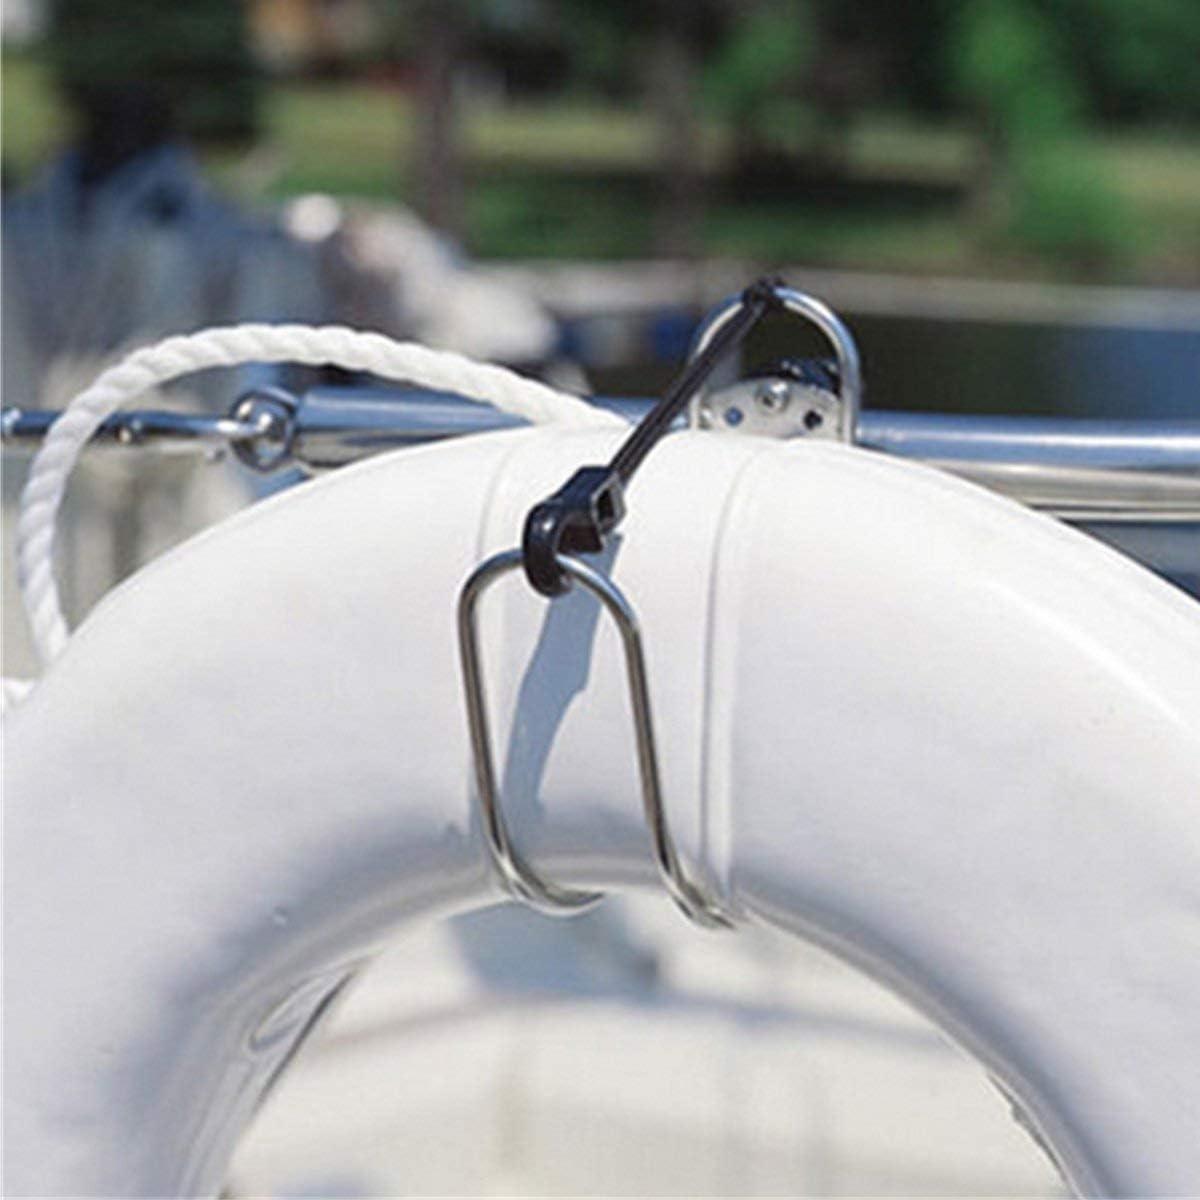 Accessories Lifebuoy Holder Stainless Steel Rowing Boat Yacht Horseshoe Bracket